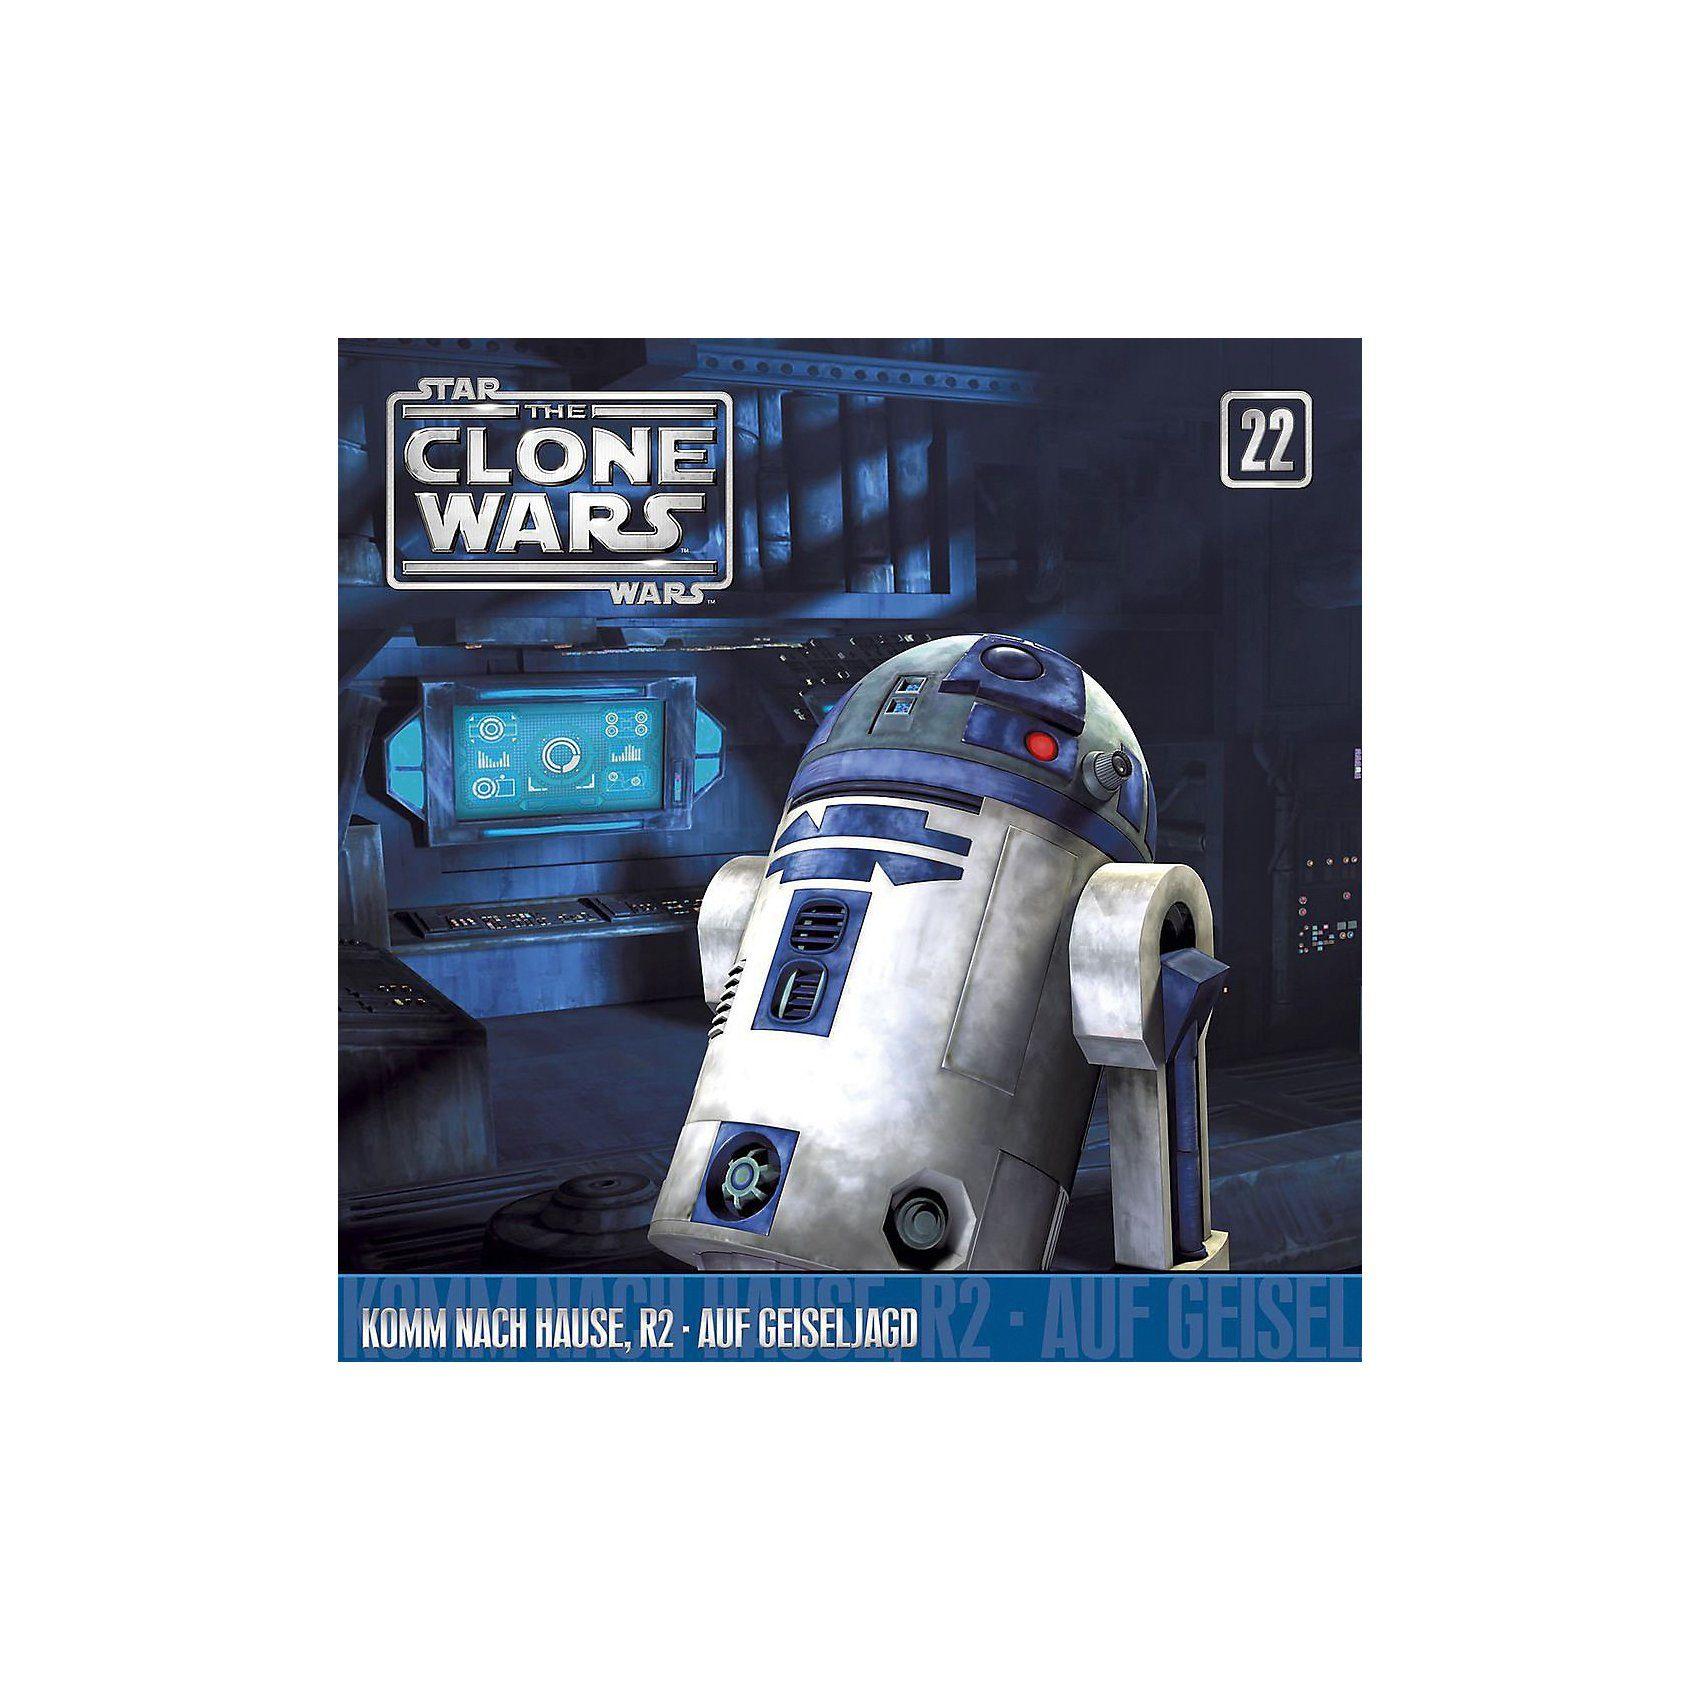 Universal CD The Clone Wars 22 - Komm nach Hause,R2/Auf Geiseljagd